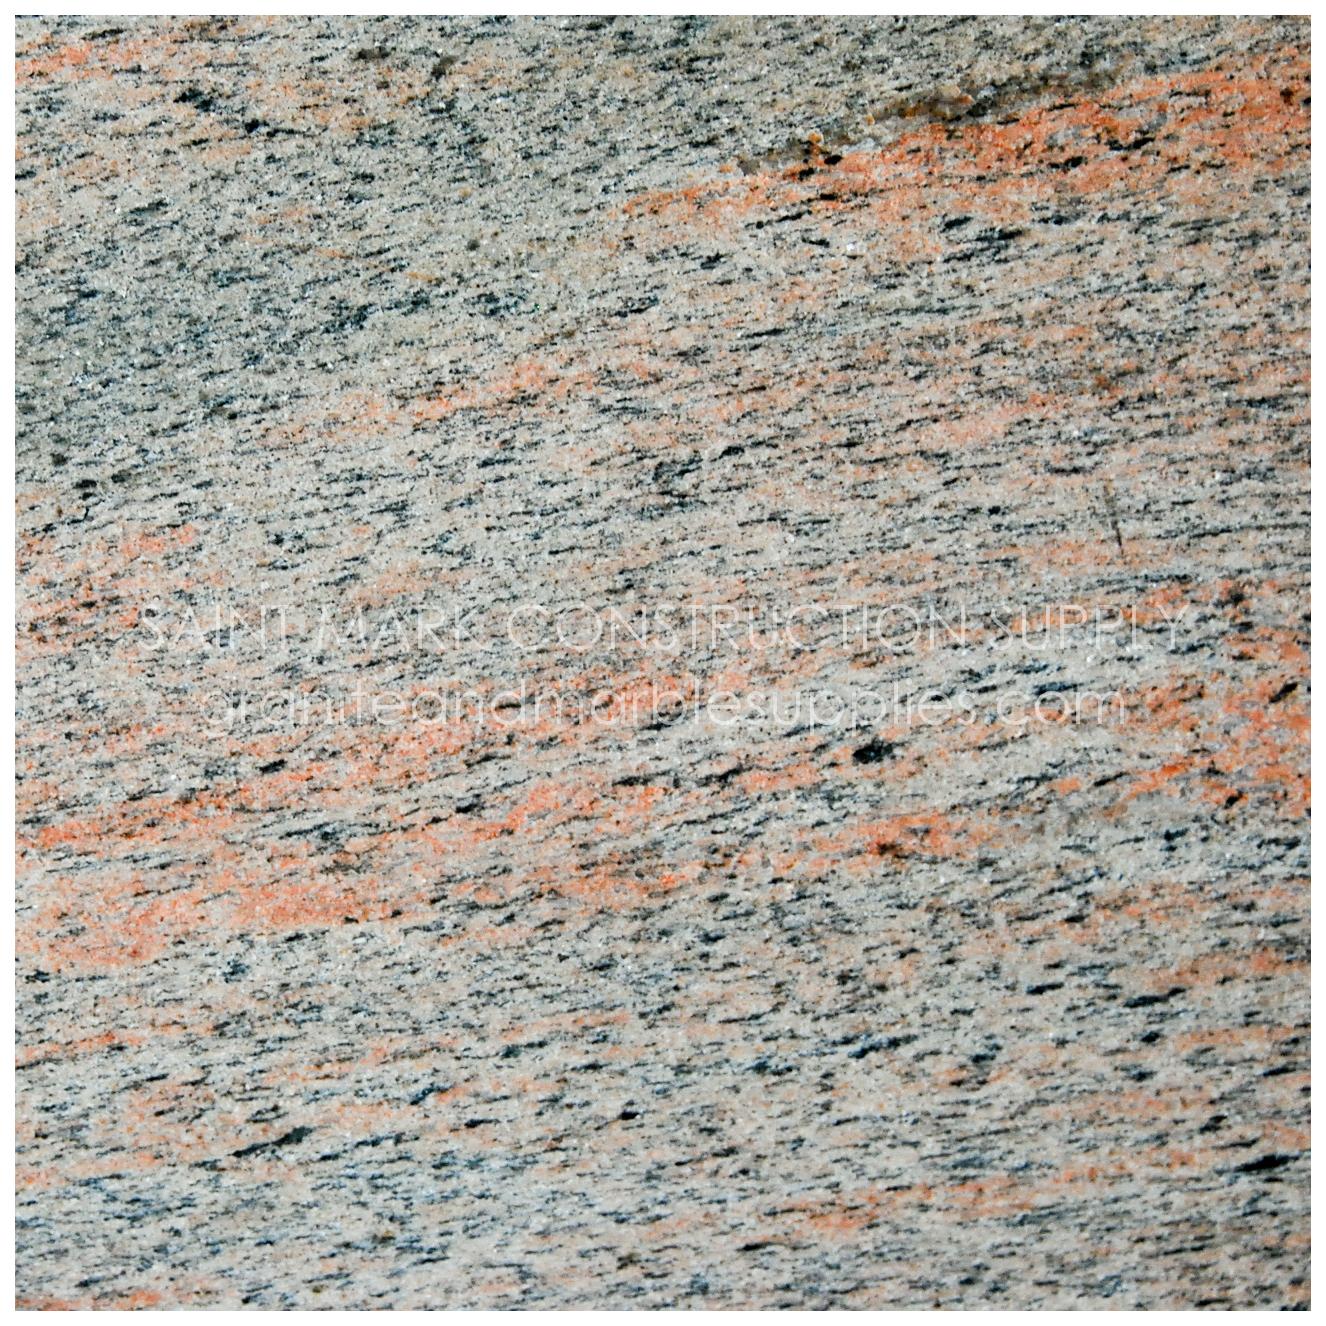 Raw Granite Stone : Raw silk saint mark construction supply